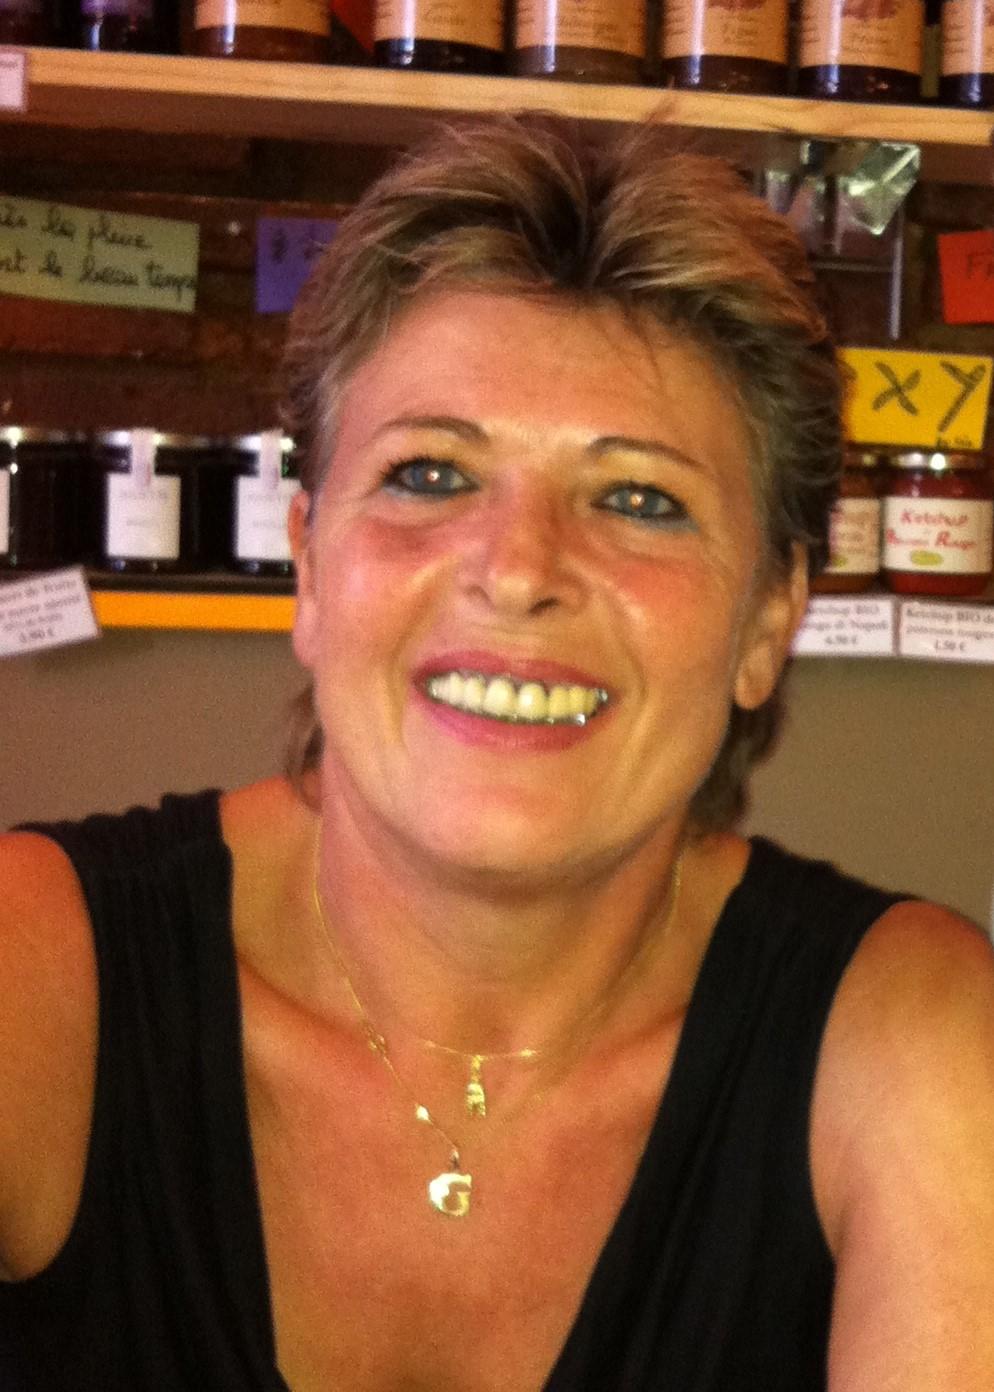 Plan Q Sur Marseille Recherche Plan Cul / Gay Rodez